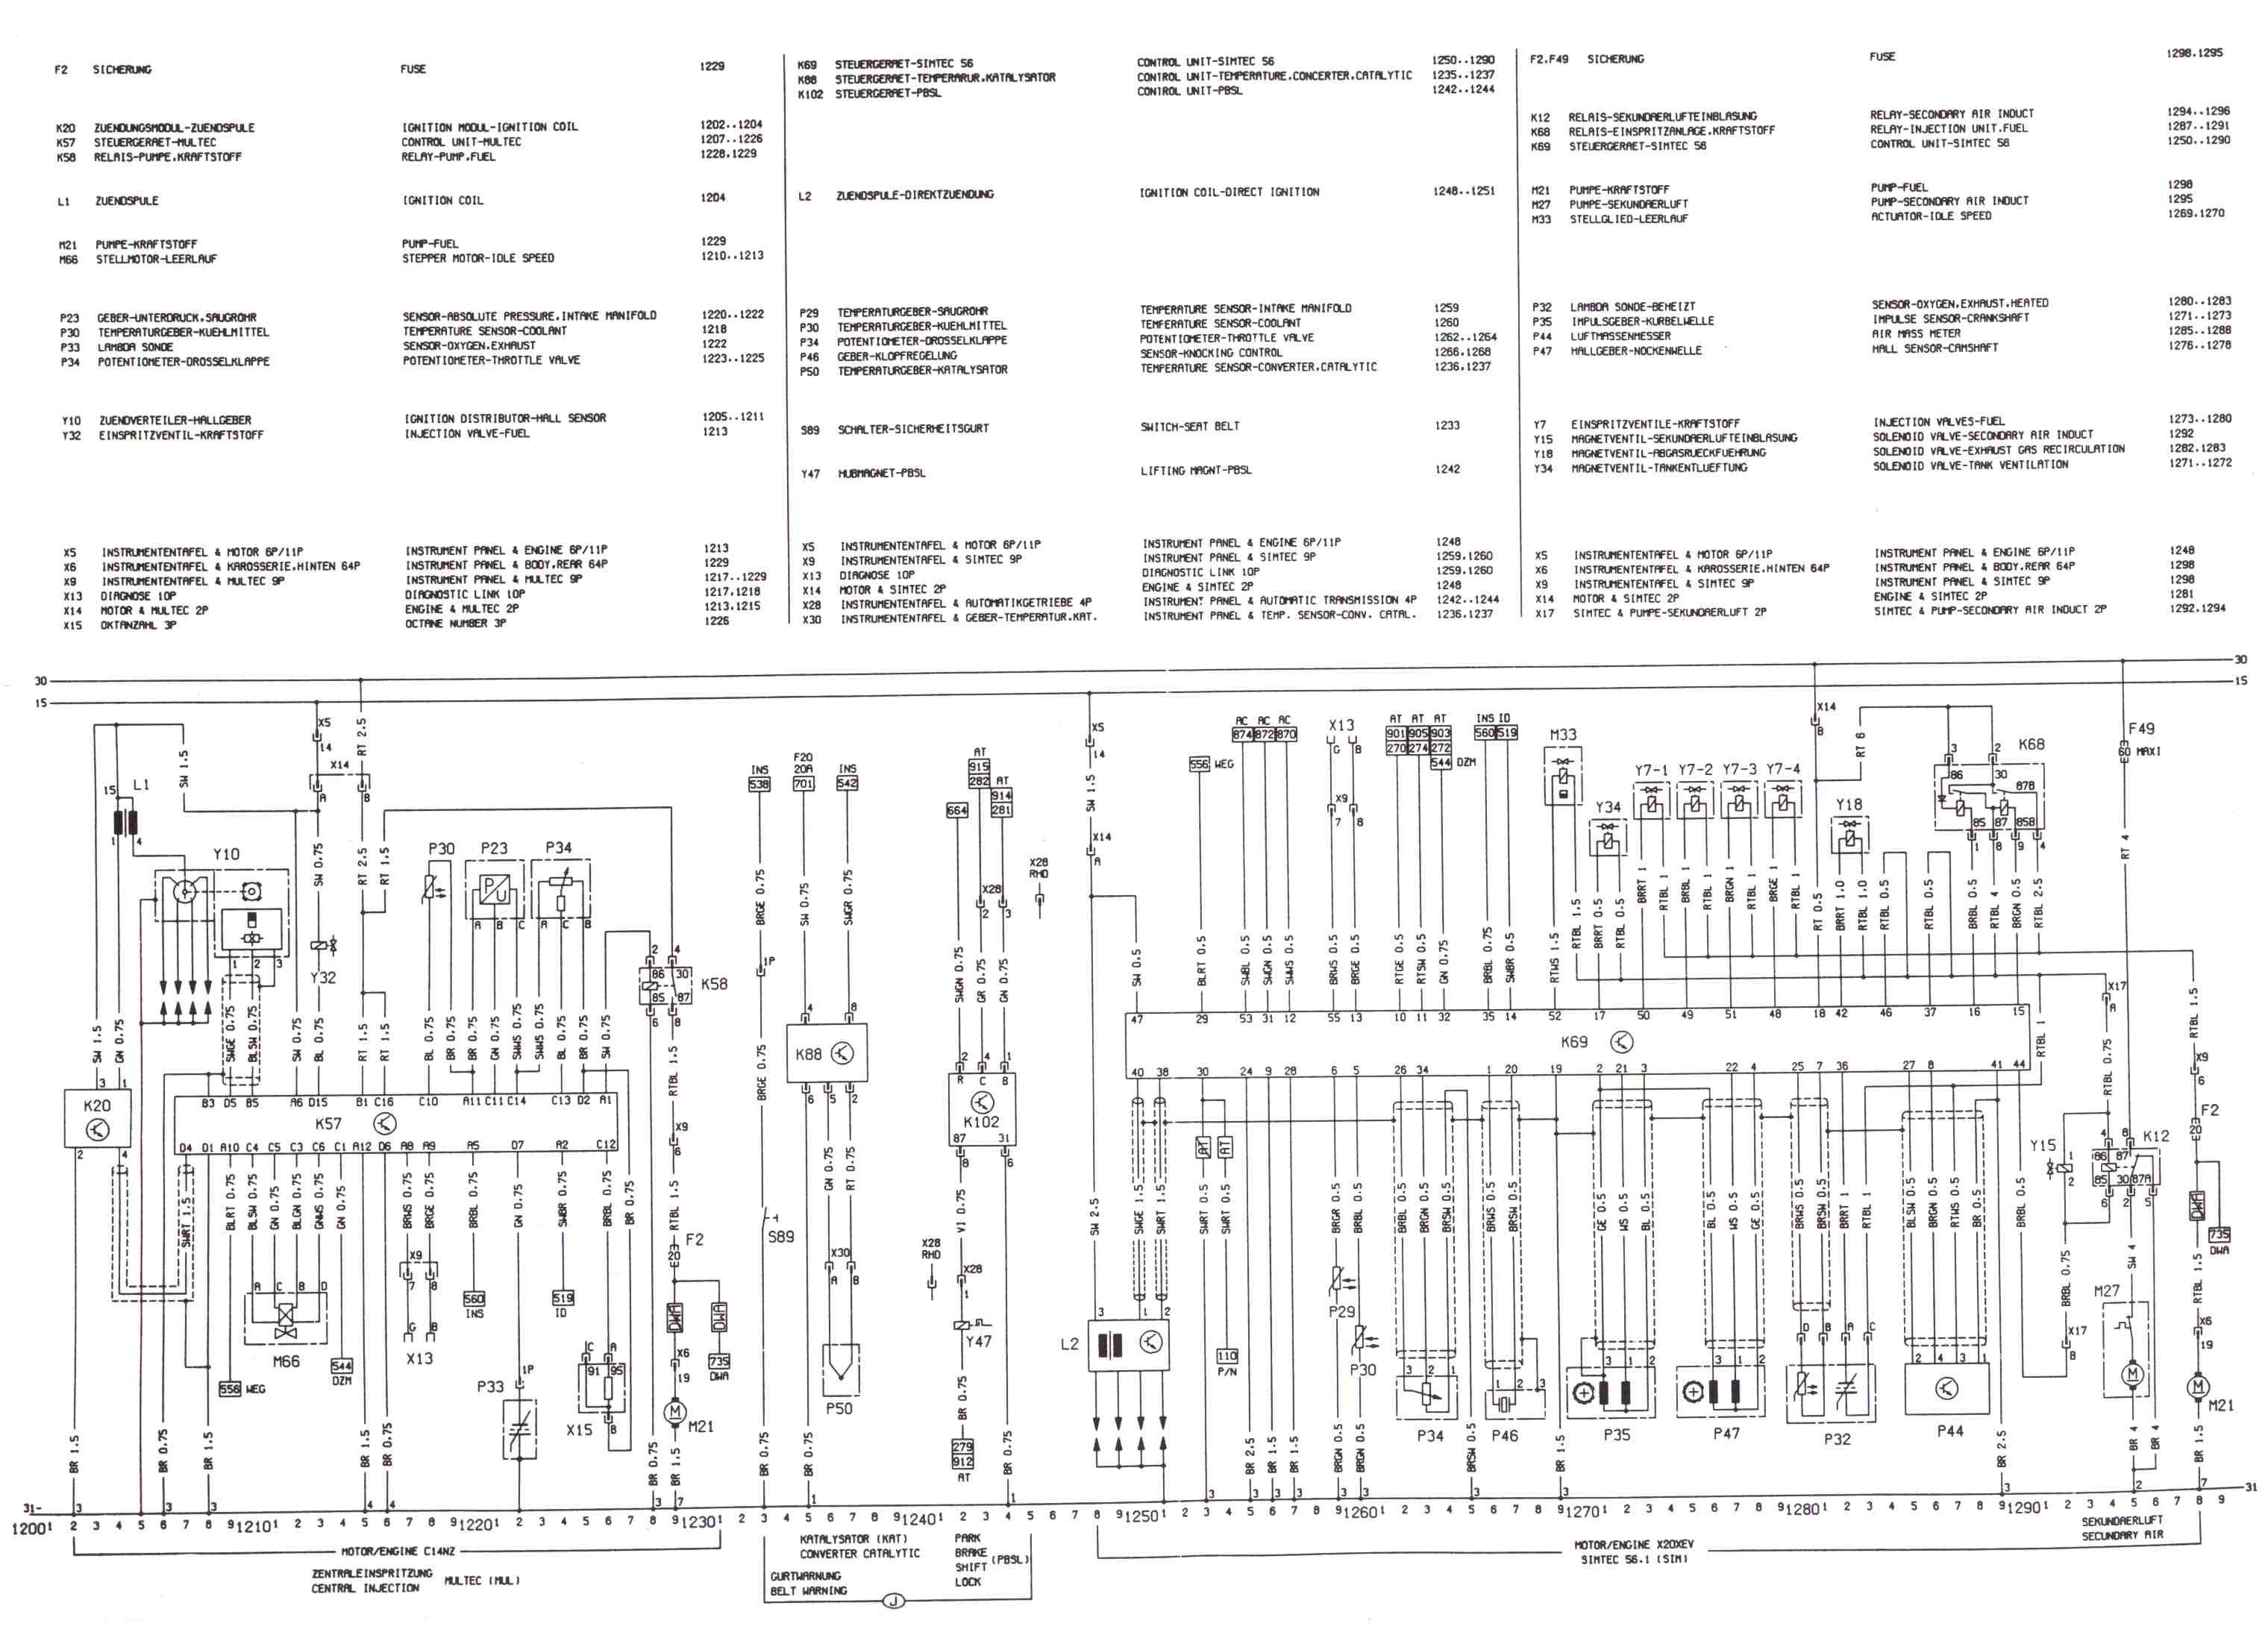 Vauxhall Astra F Wiring Diagram Diagram Base Website Wiring Diagram -  HEARTDIAGRAMWORKSHEET.RIFUGIDELLAROSA.ITDiagram Base Website Full Edition - rifugidellarosa